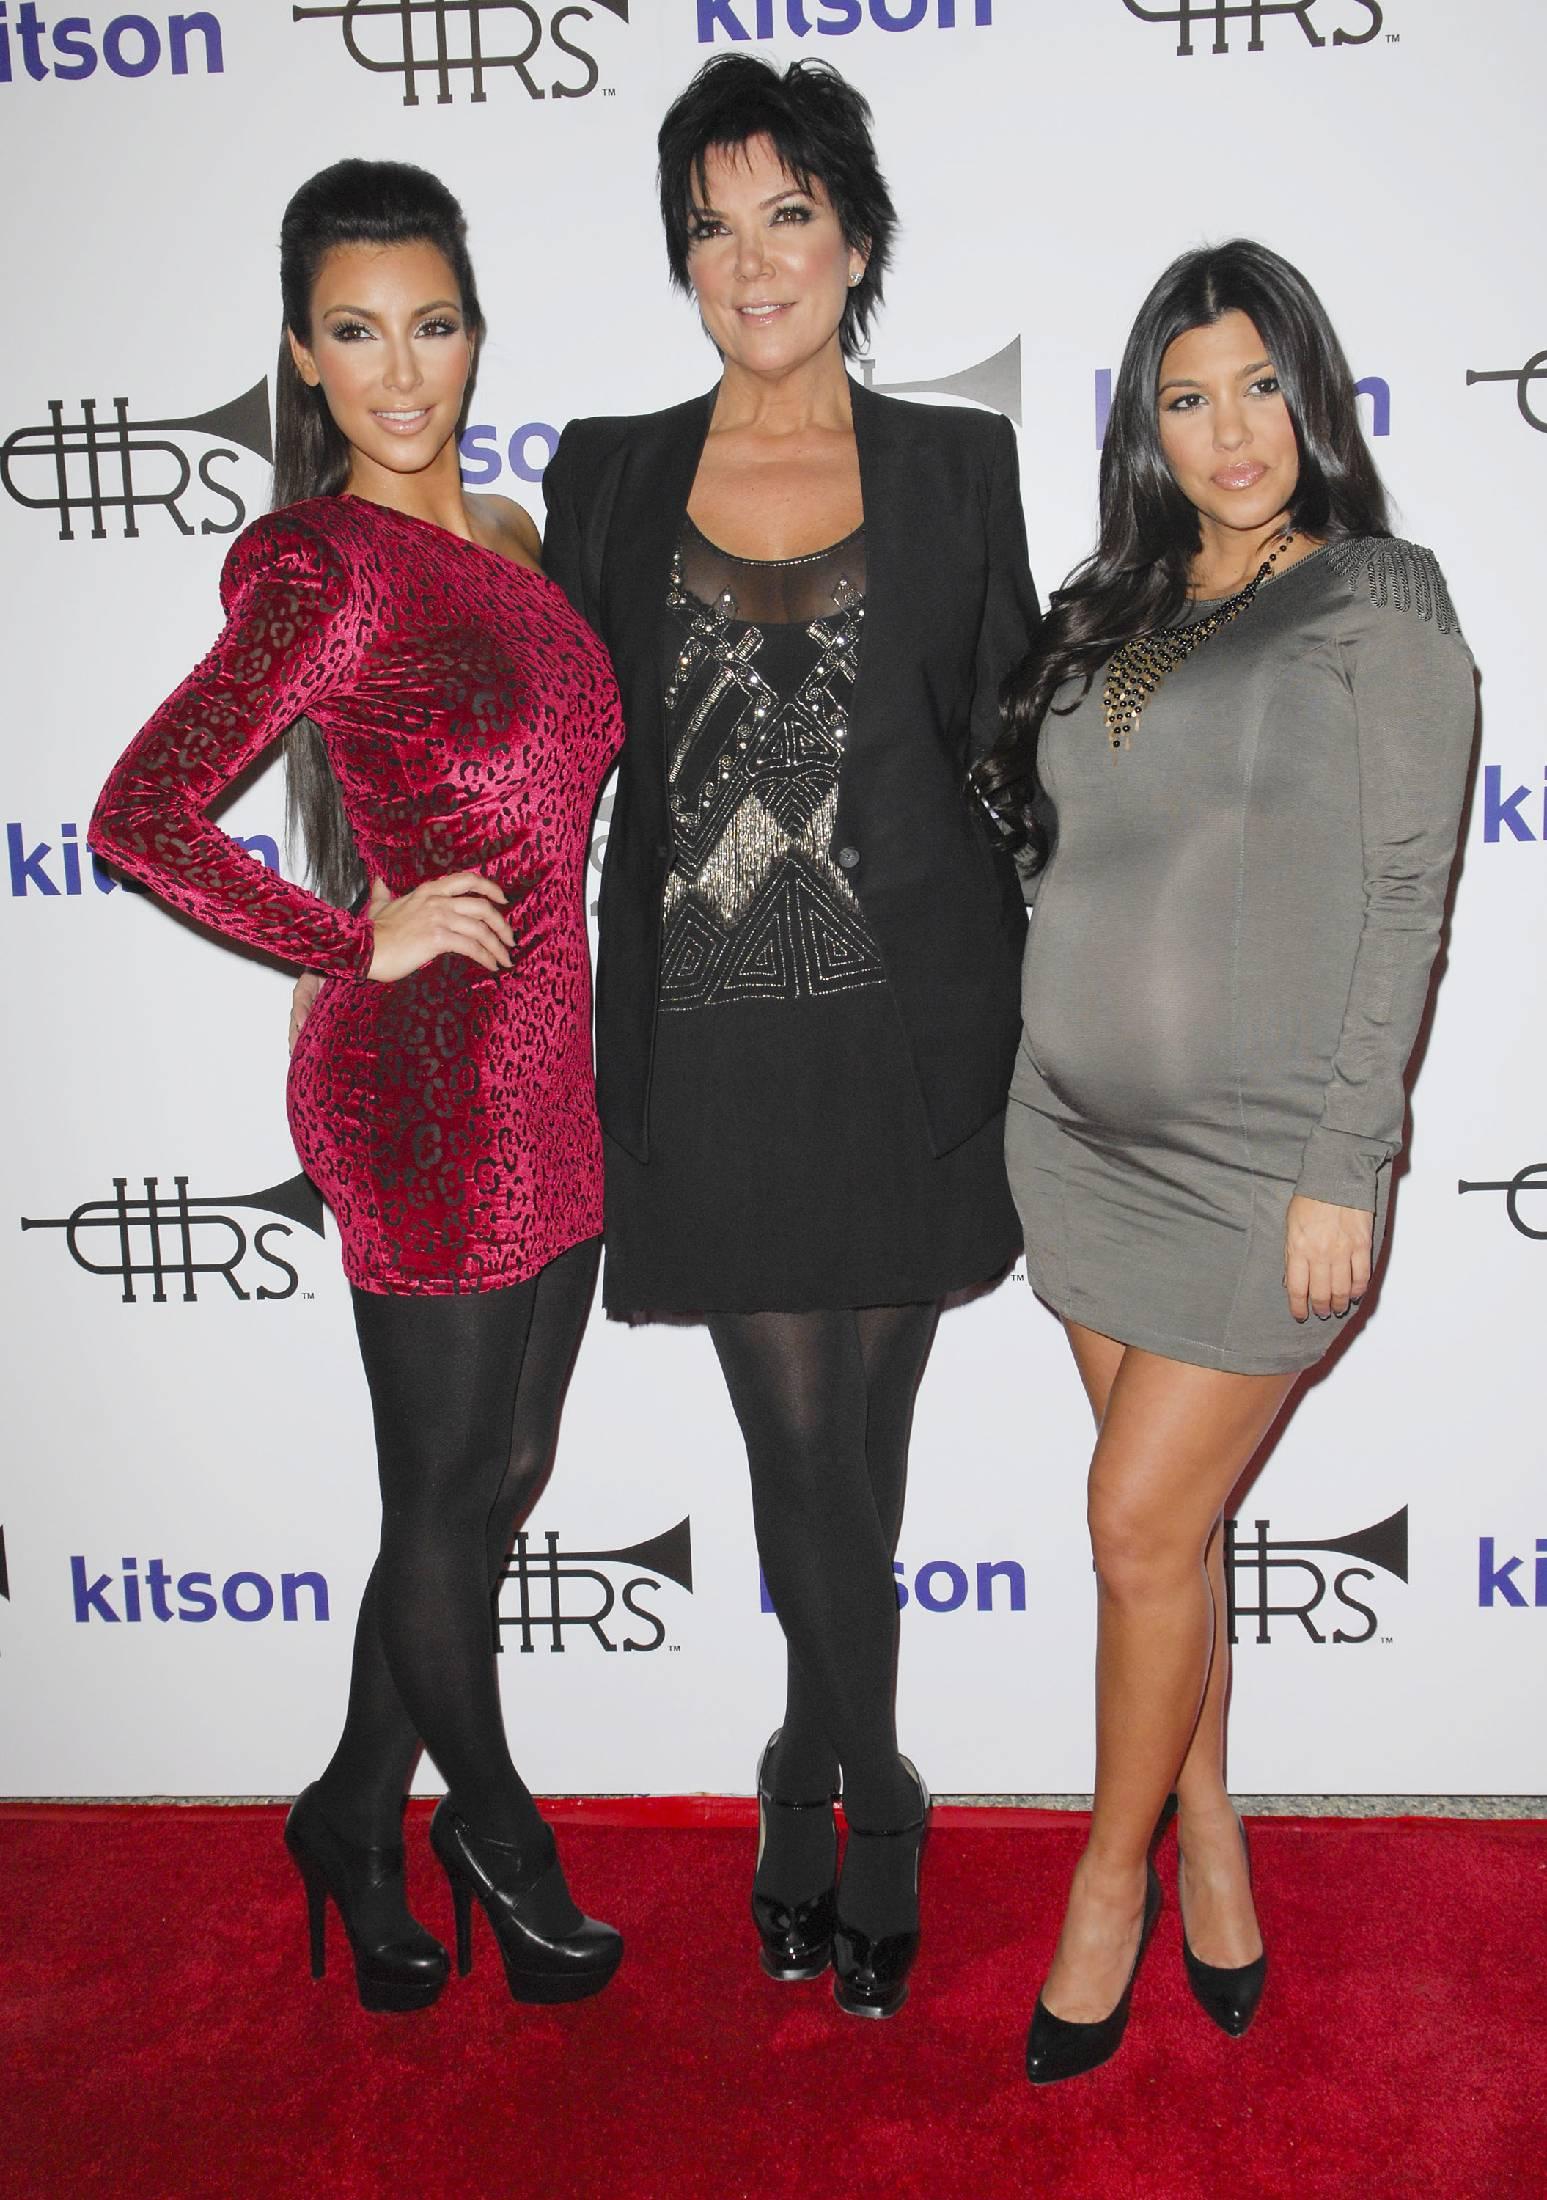 44977_Kim_Kardashian_04_122_260lo.jpg